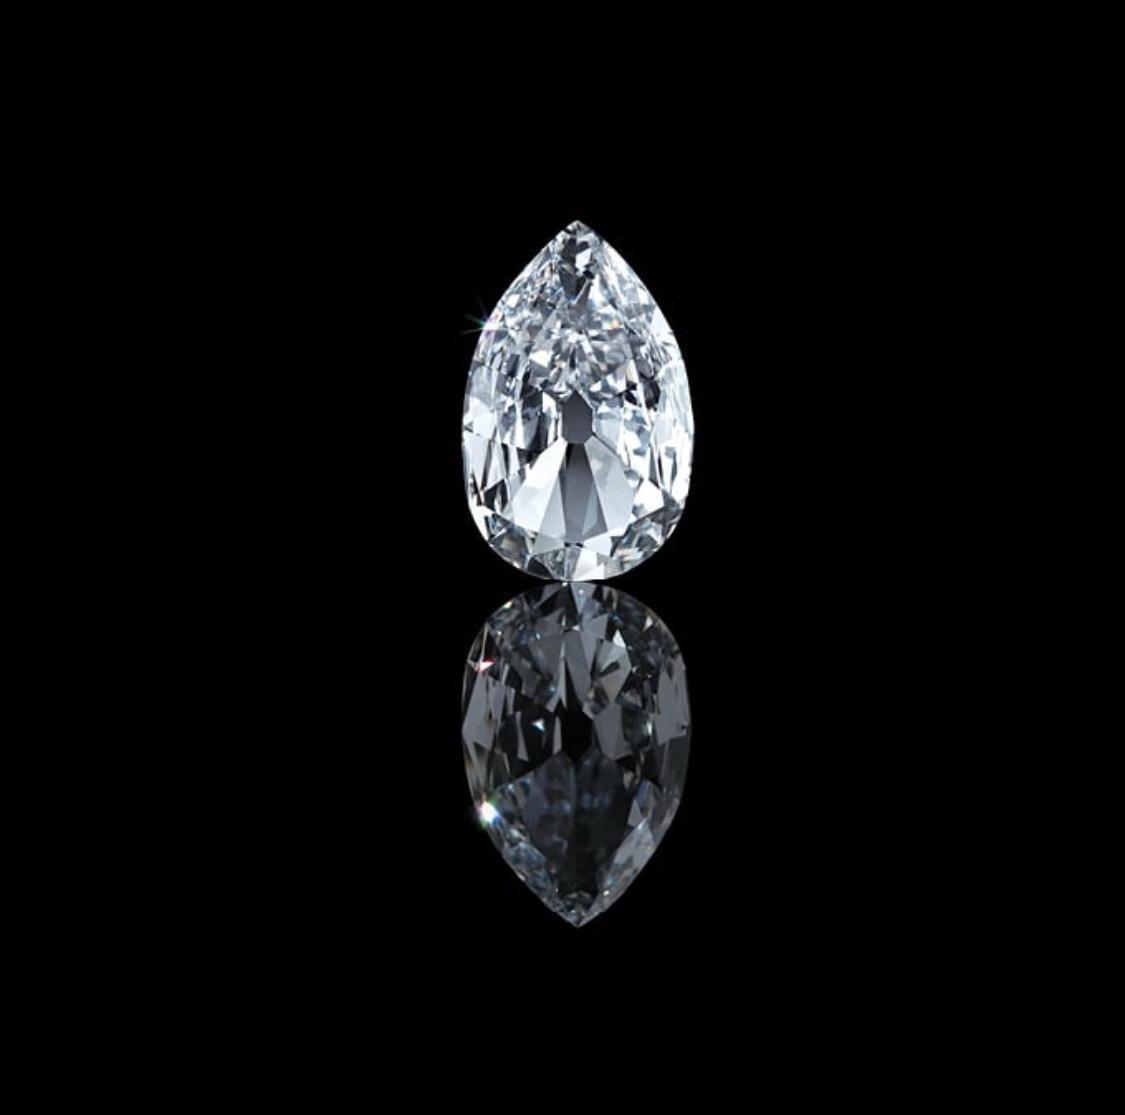 Arcot II diamond.  Photo source: christies.com